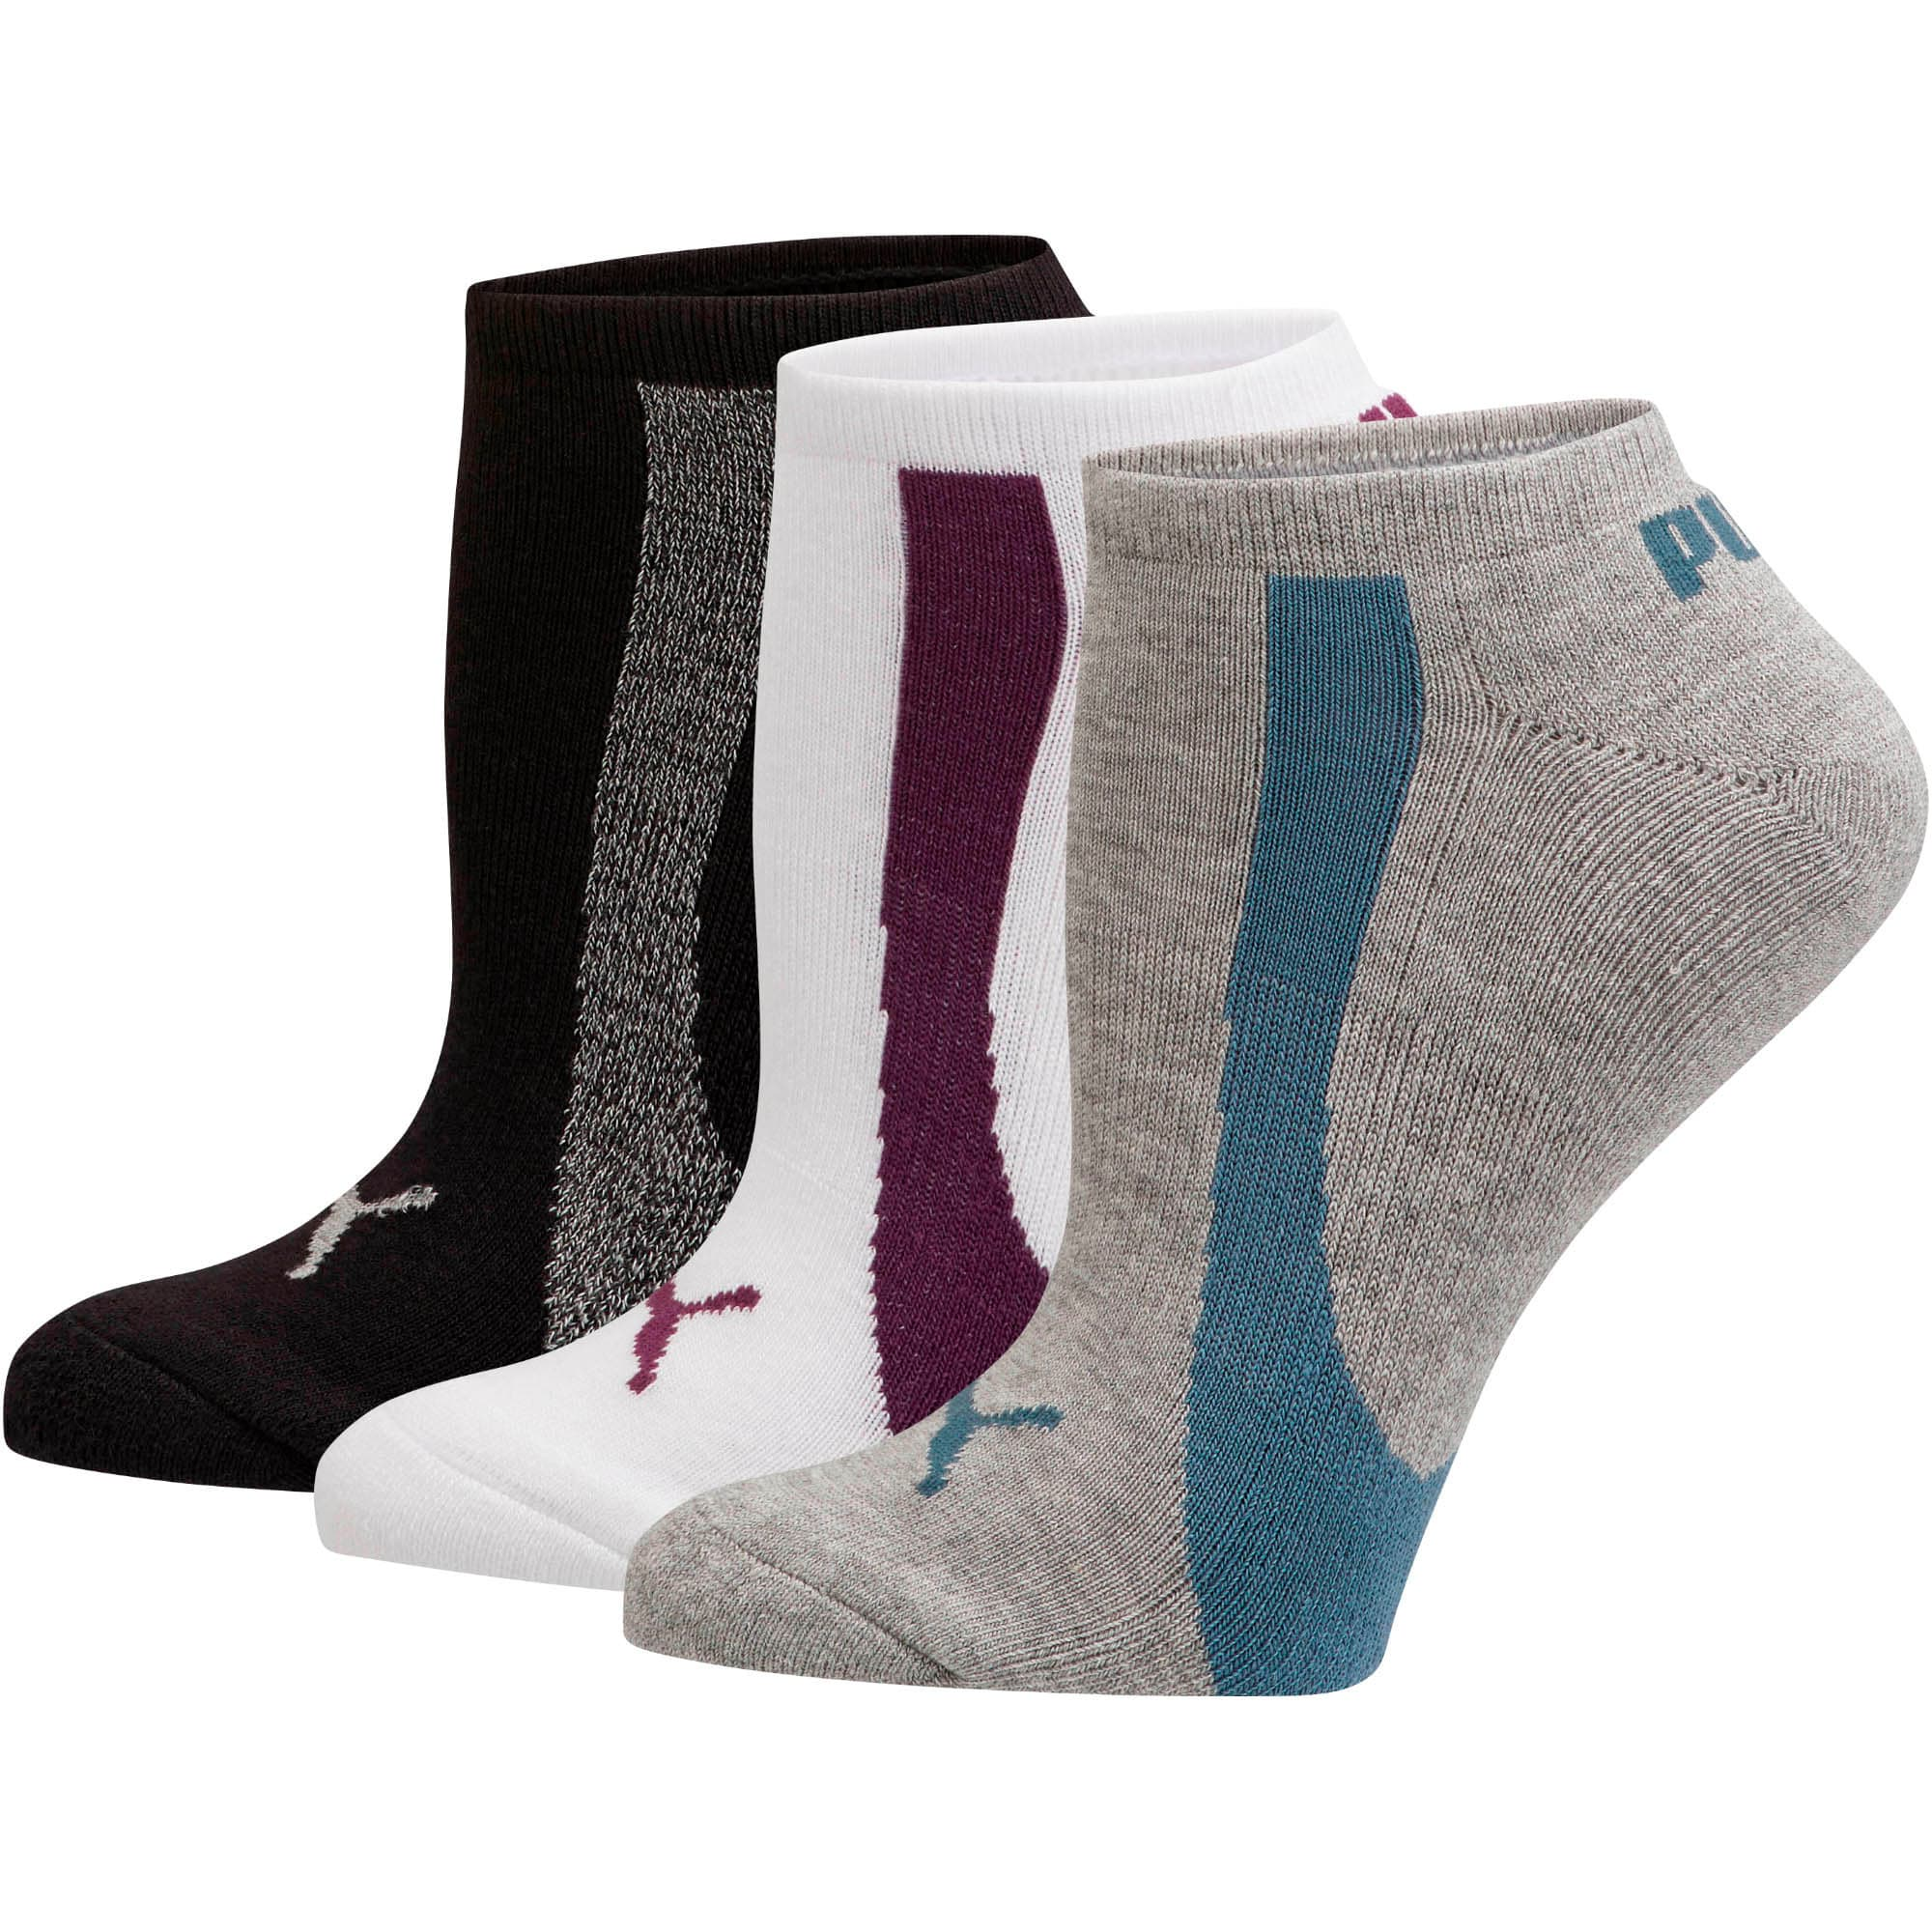 Thumbnail 1 of Women's No Show Socks [3 Pack], GREY / BLUE, medium